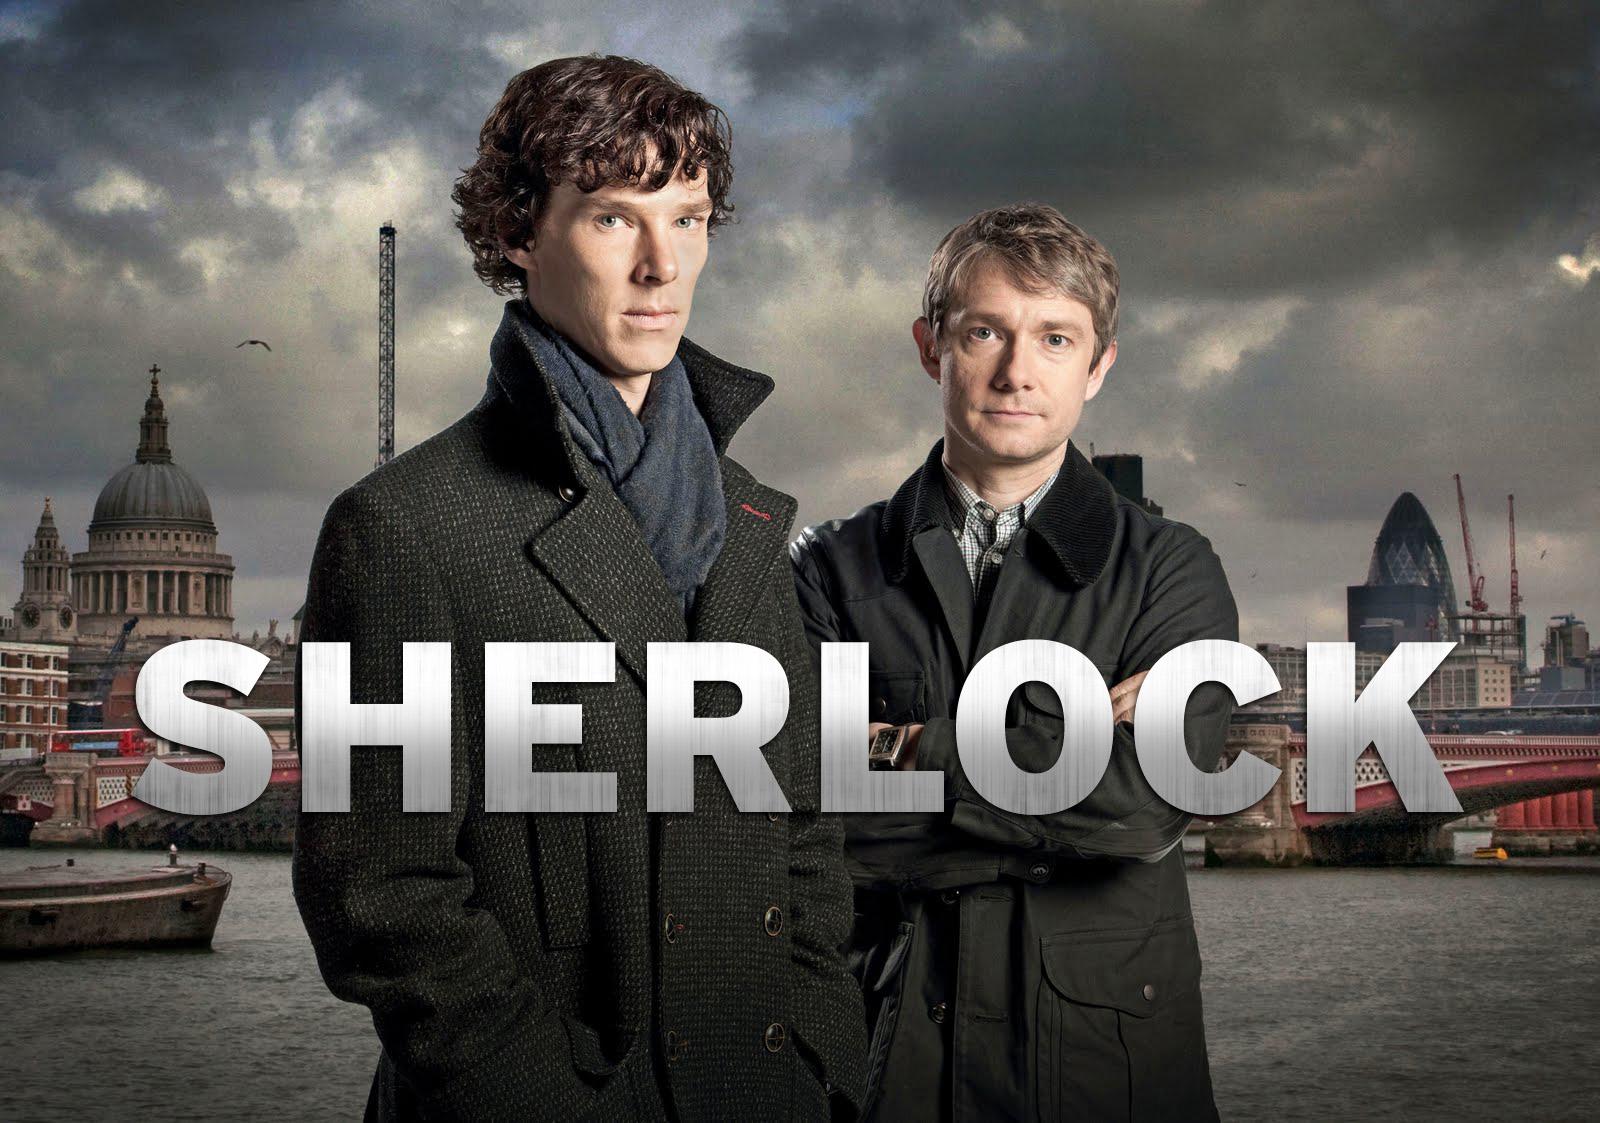 http://www.notzombies.com/wp-content/uploads/2010/12/bbc-sherlock-1600.jpg